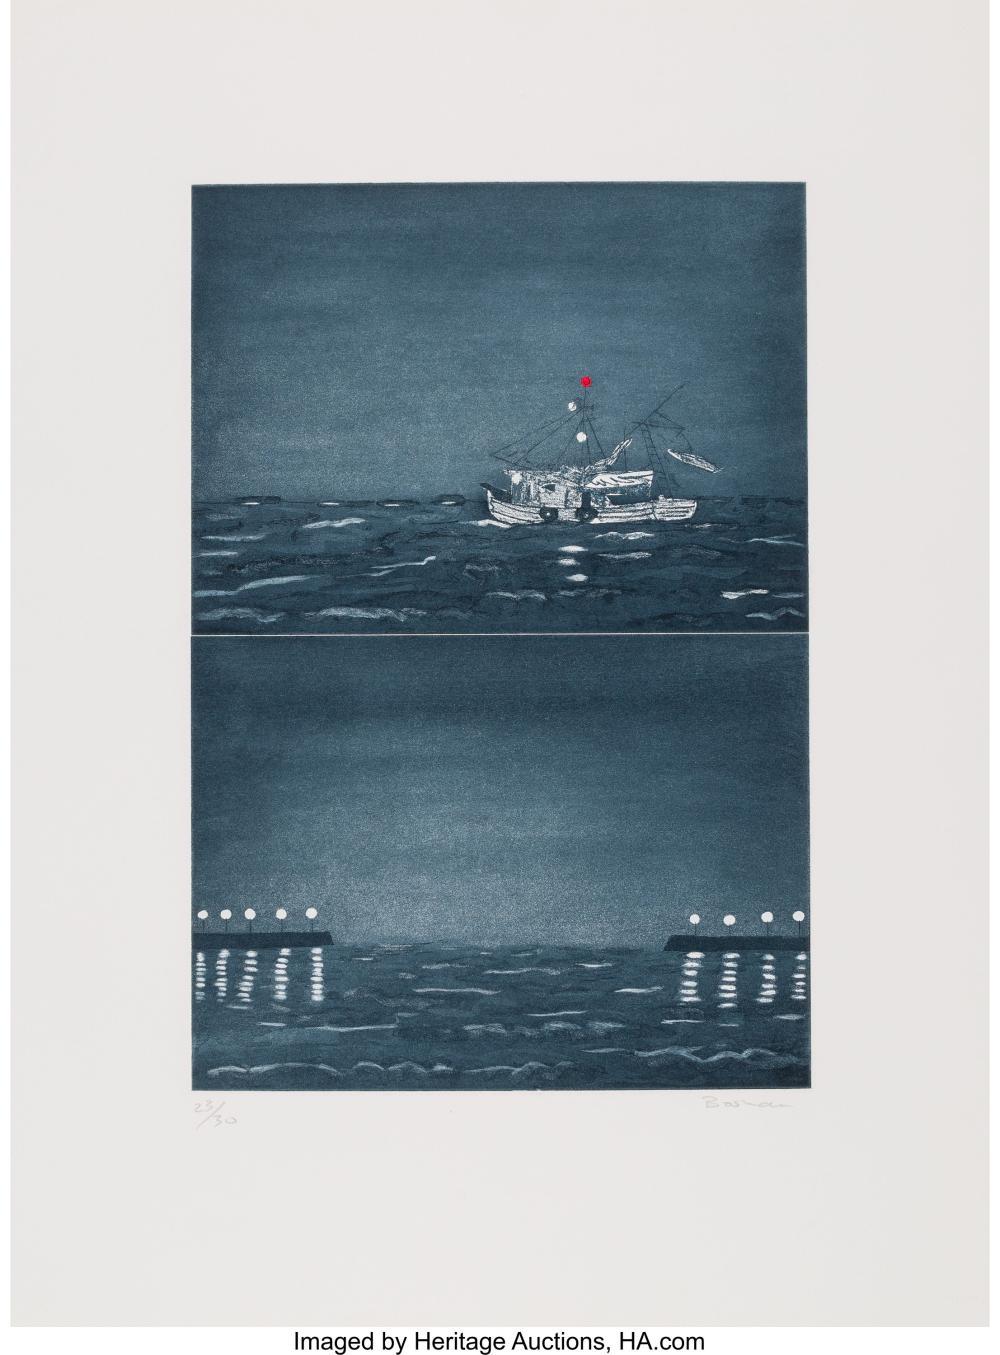 Lot 21327: Richard Bosman (b. 1944) Homeward Bound, 1990 Mezzotint in colors on wove paper